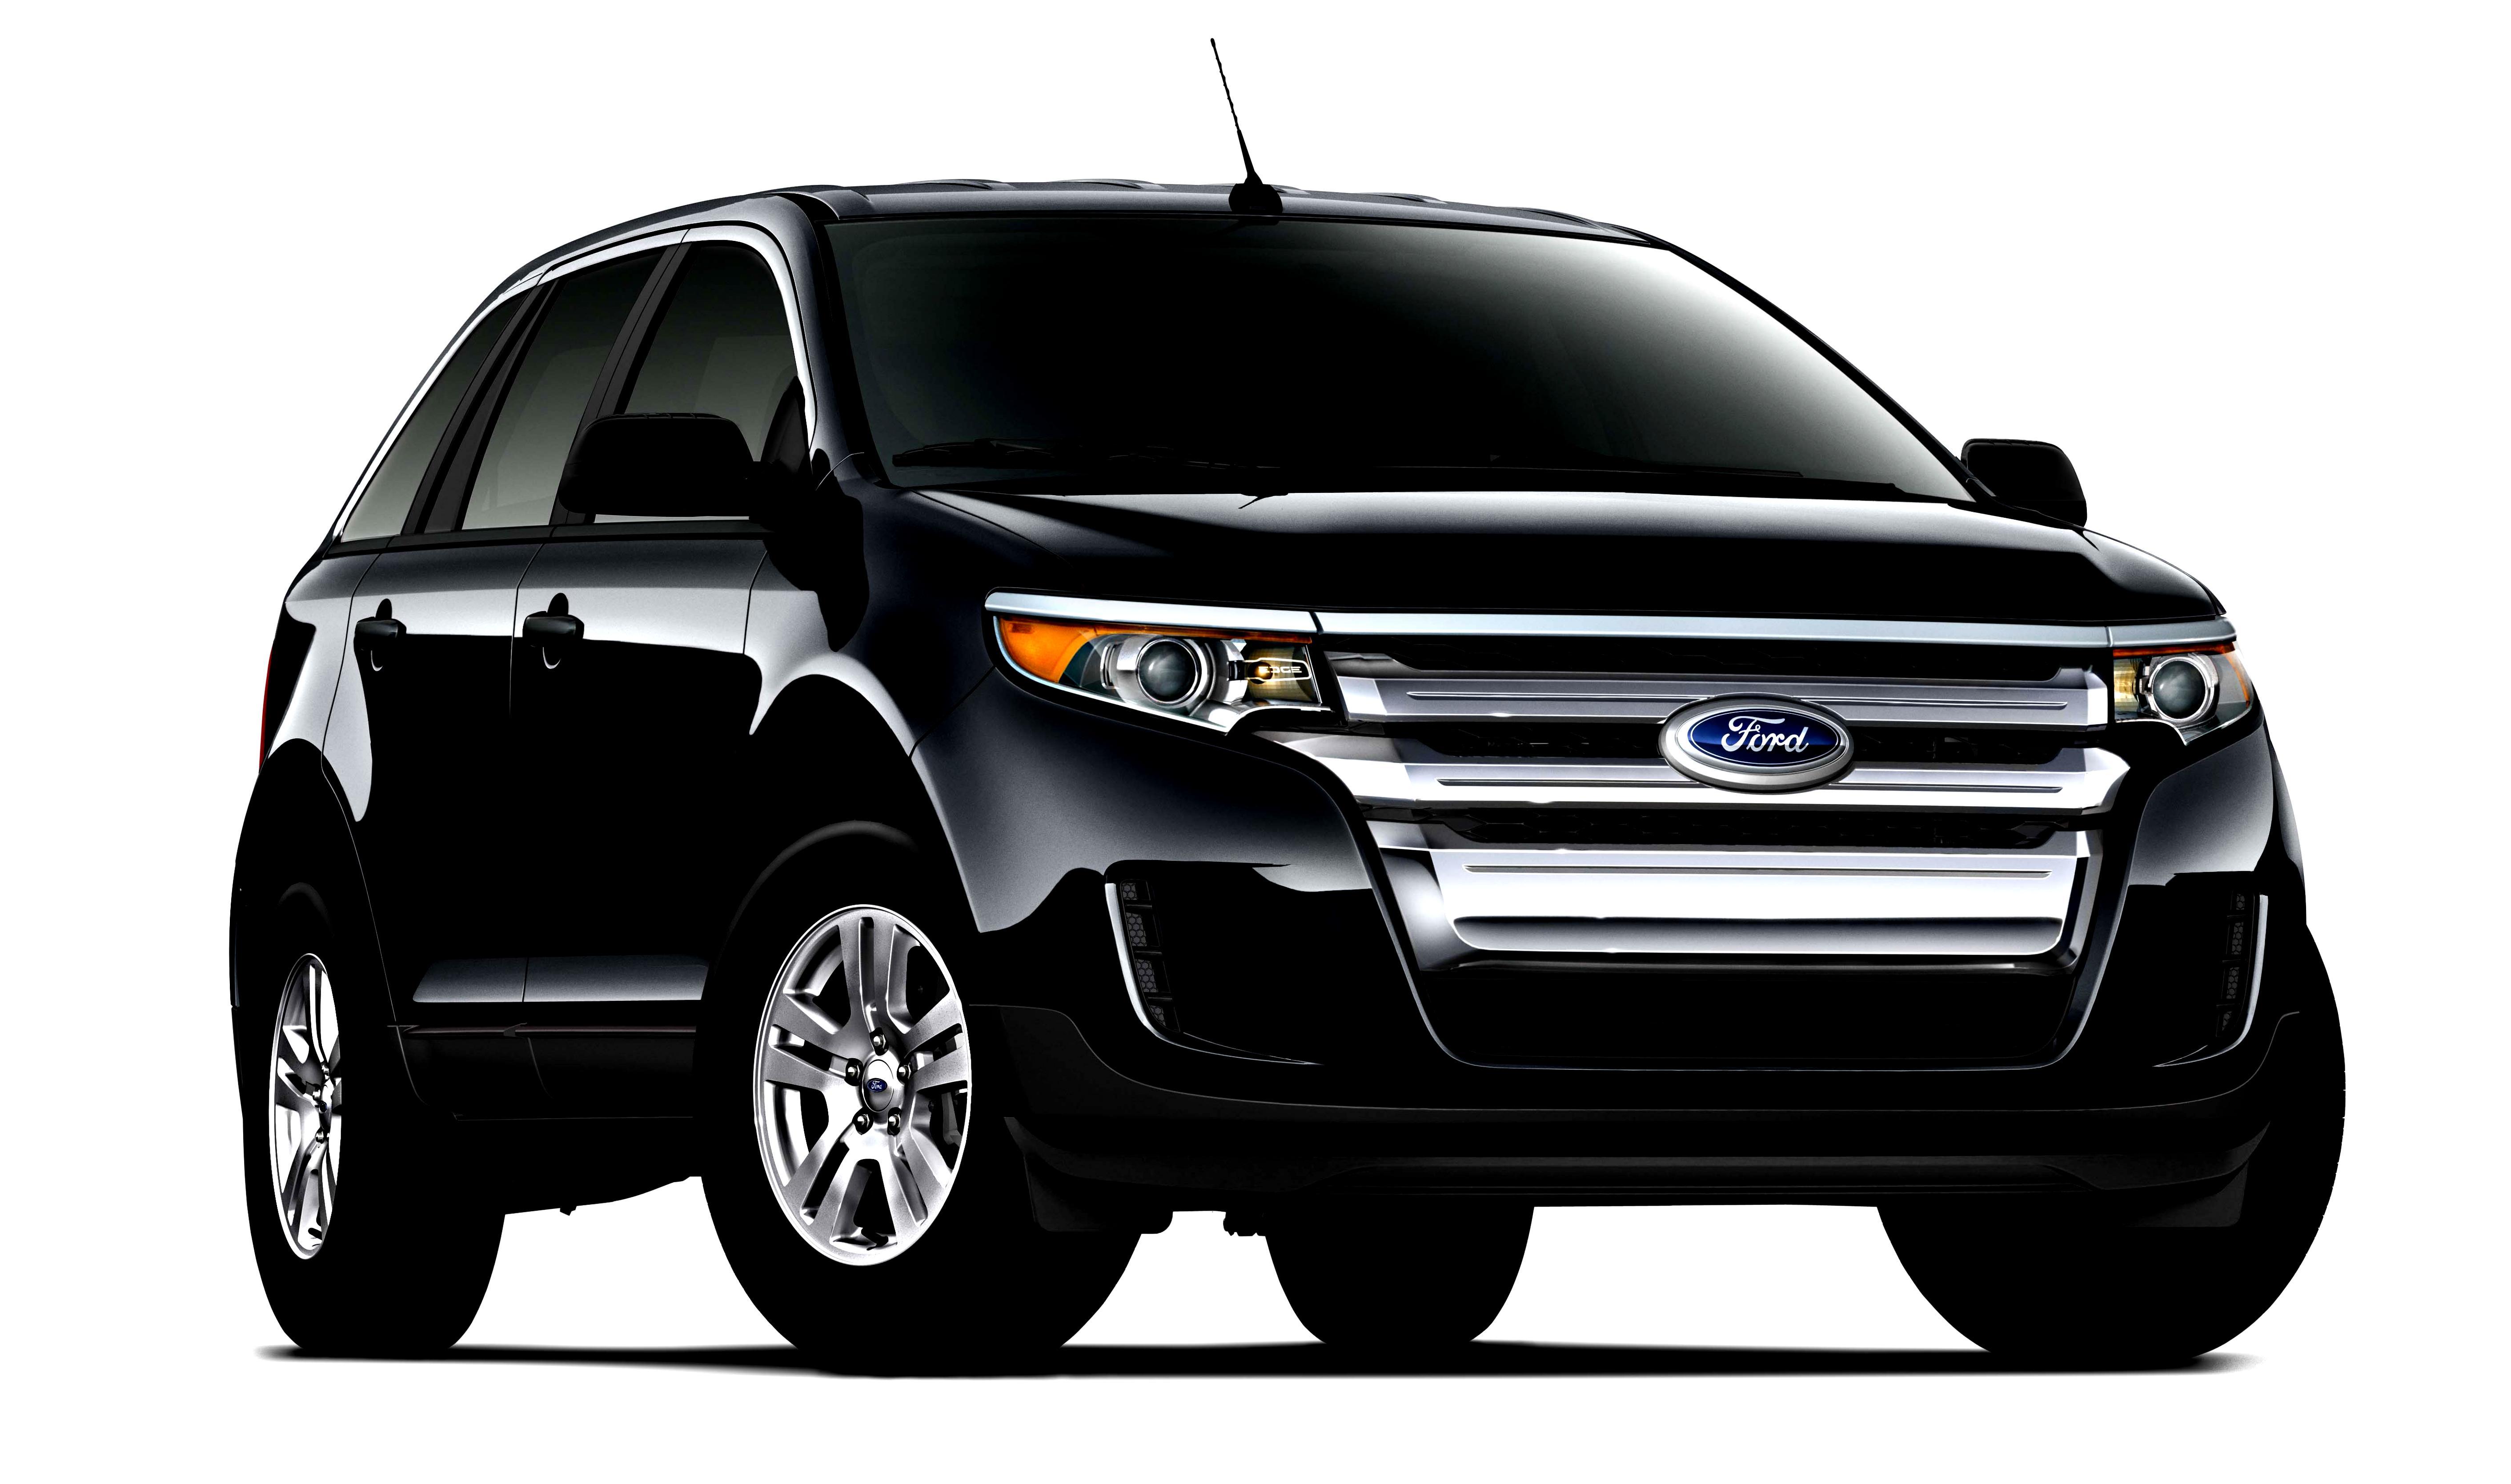 Ford Edge 2014 On Motoimg Com